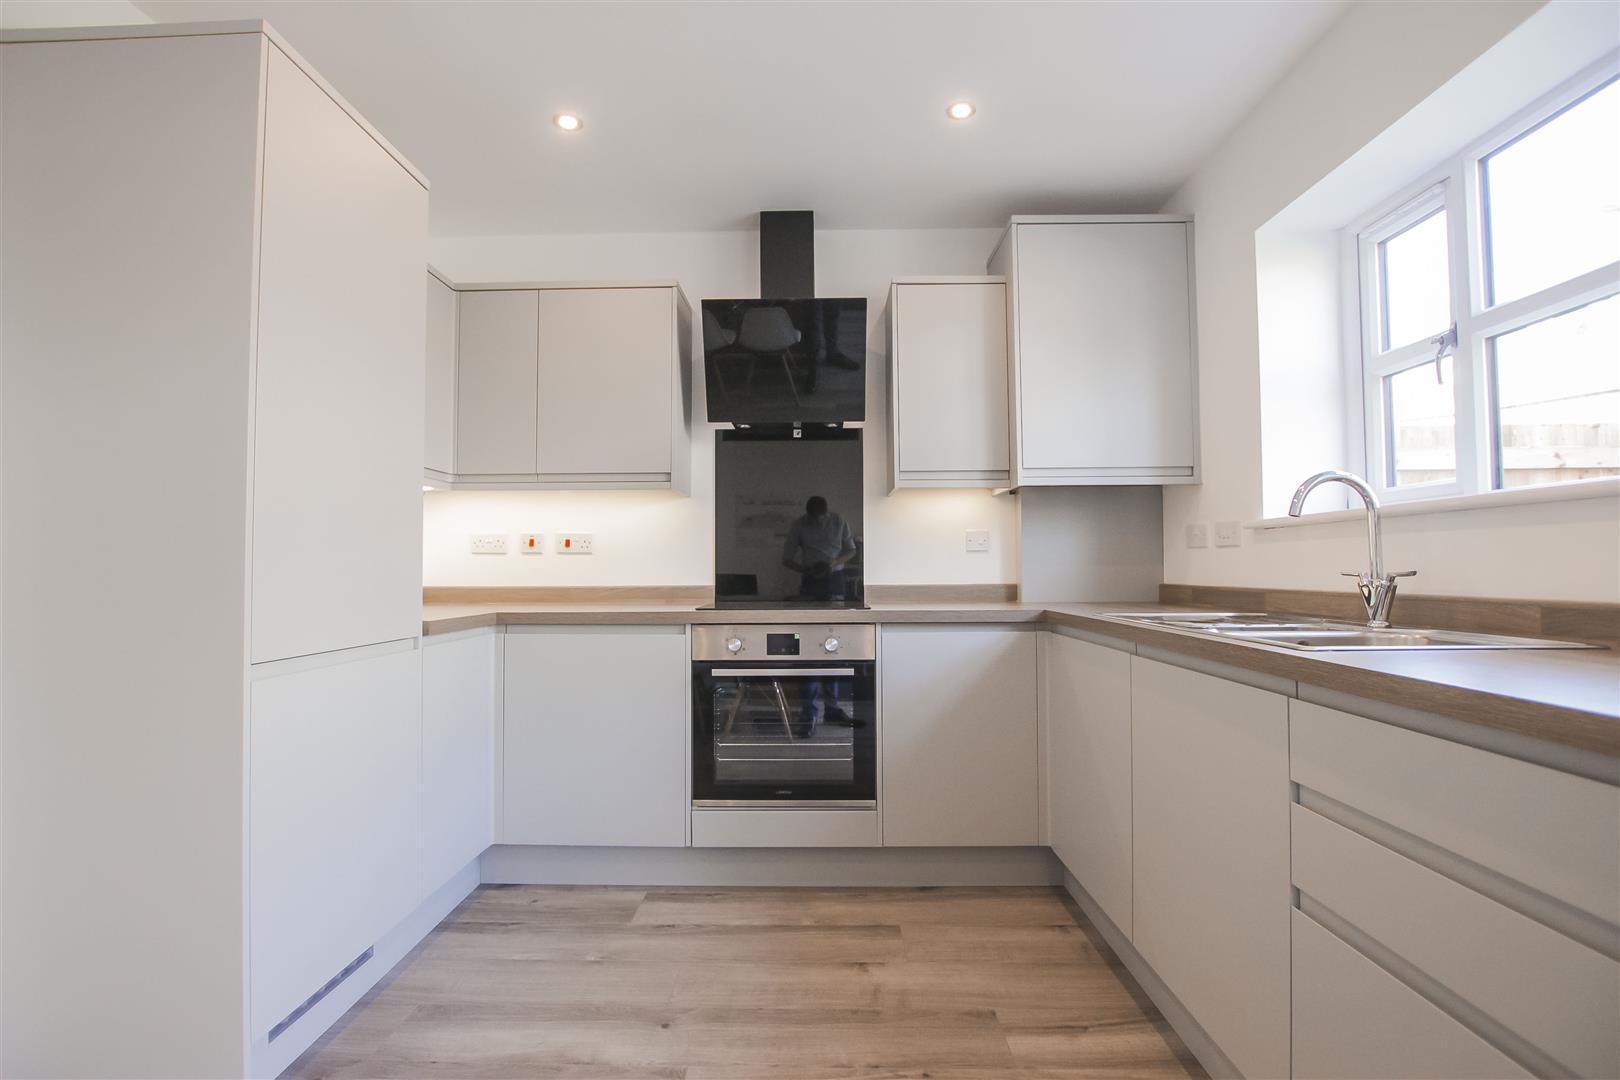 4 Bedroom Detached House For Sale - Show Home Kitchen (3).jpg